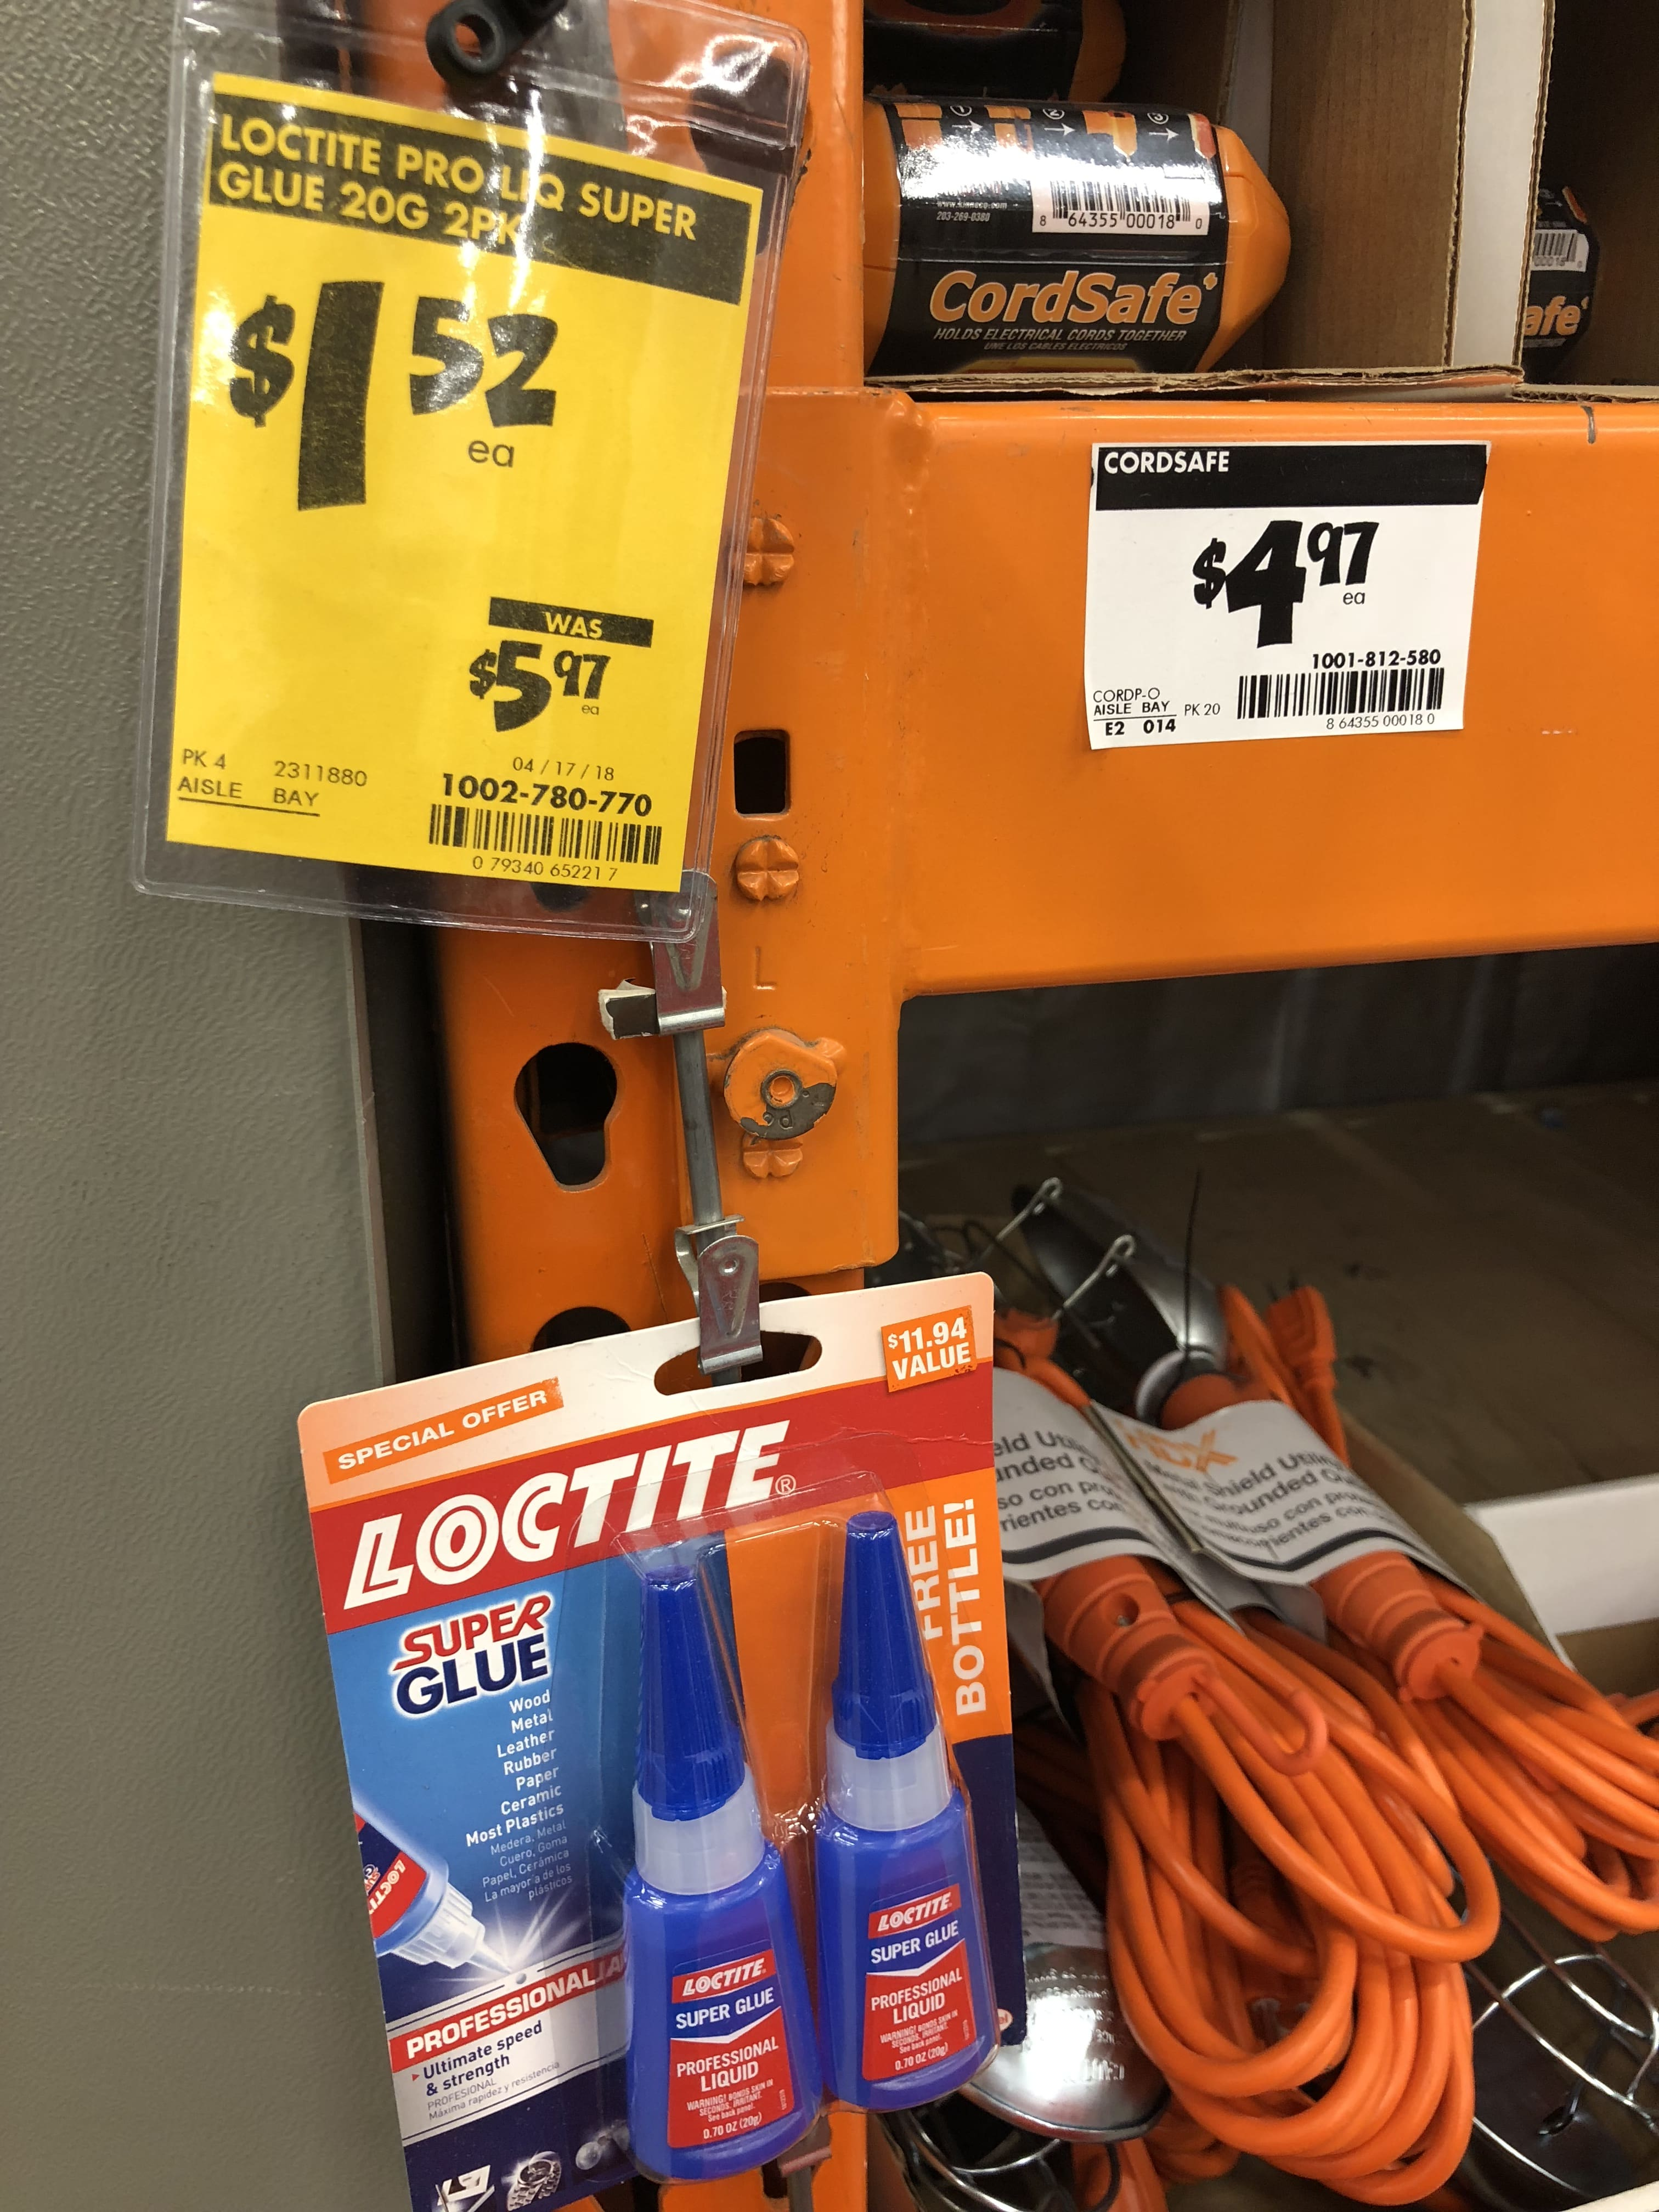 Home Depot Loce Super Glue Clearance B M Ymmv 1 52